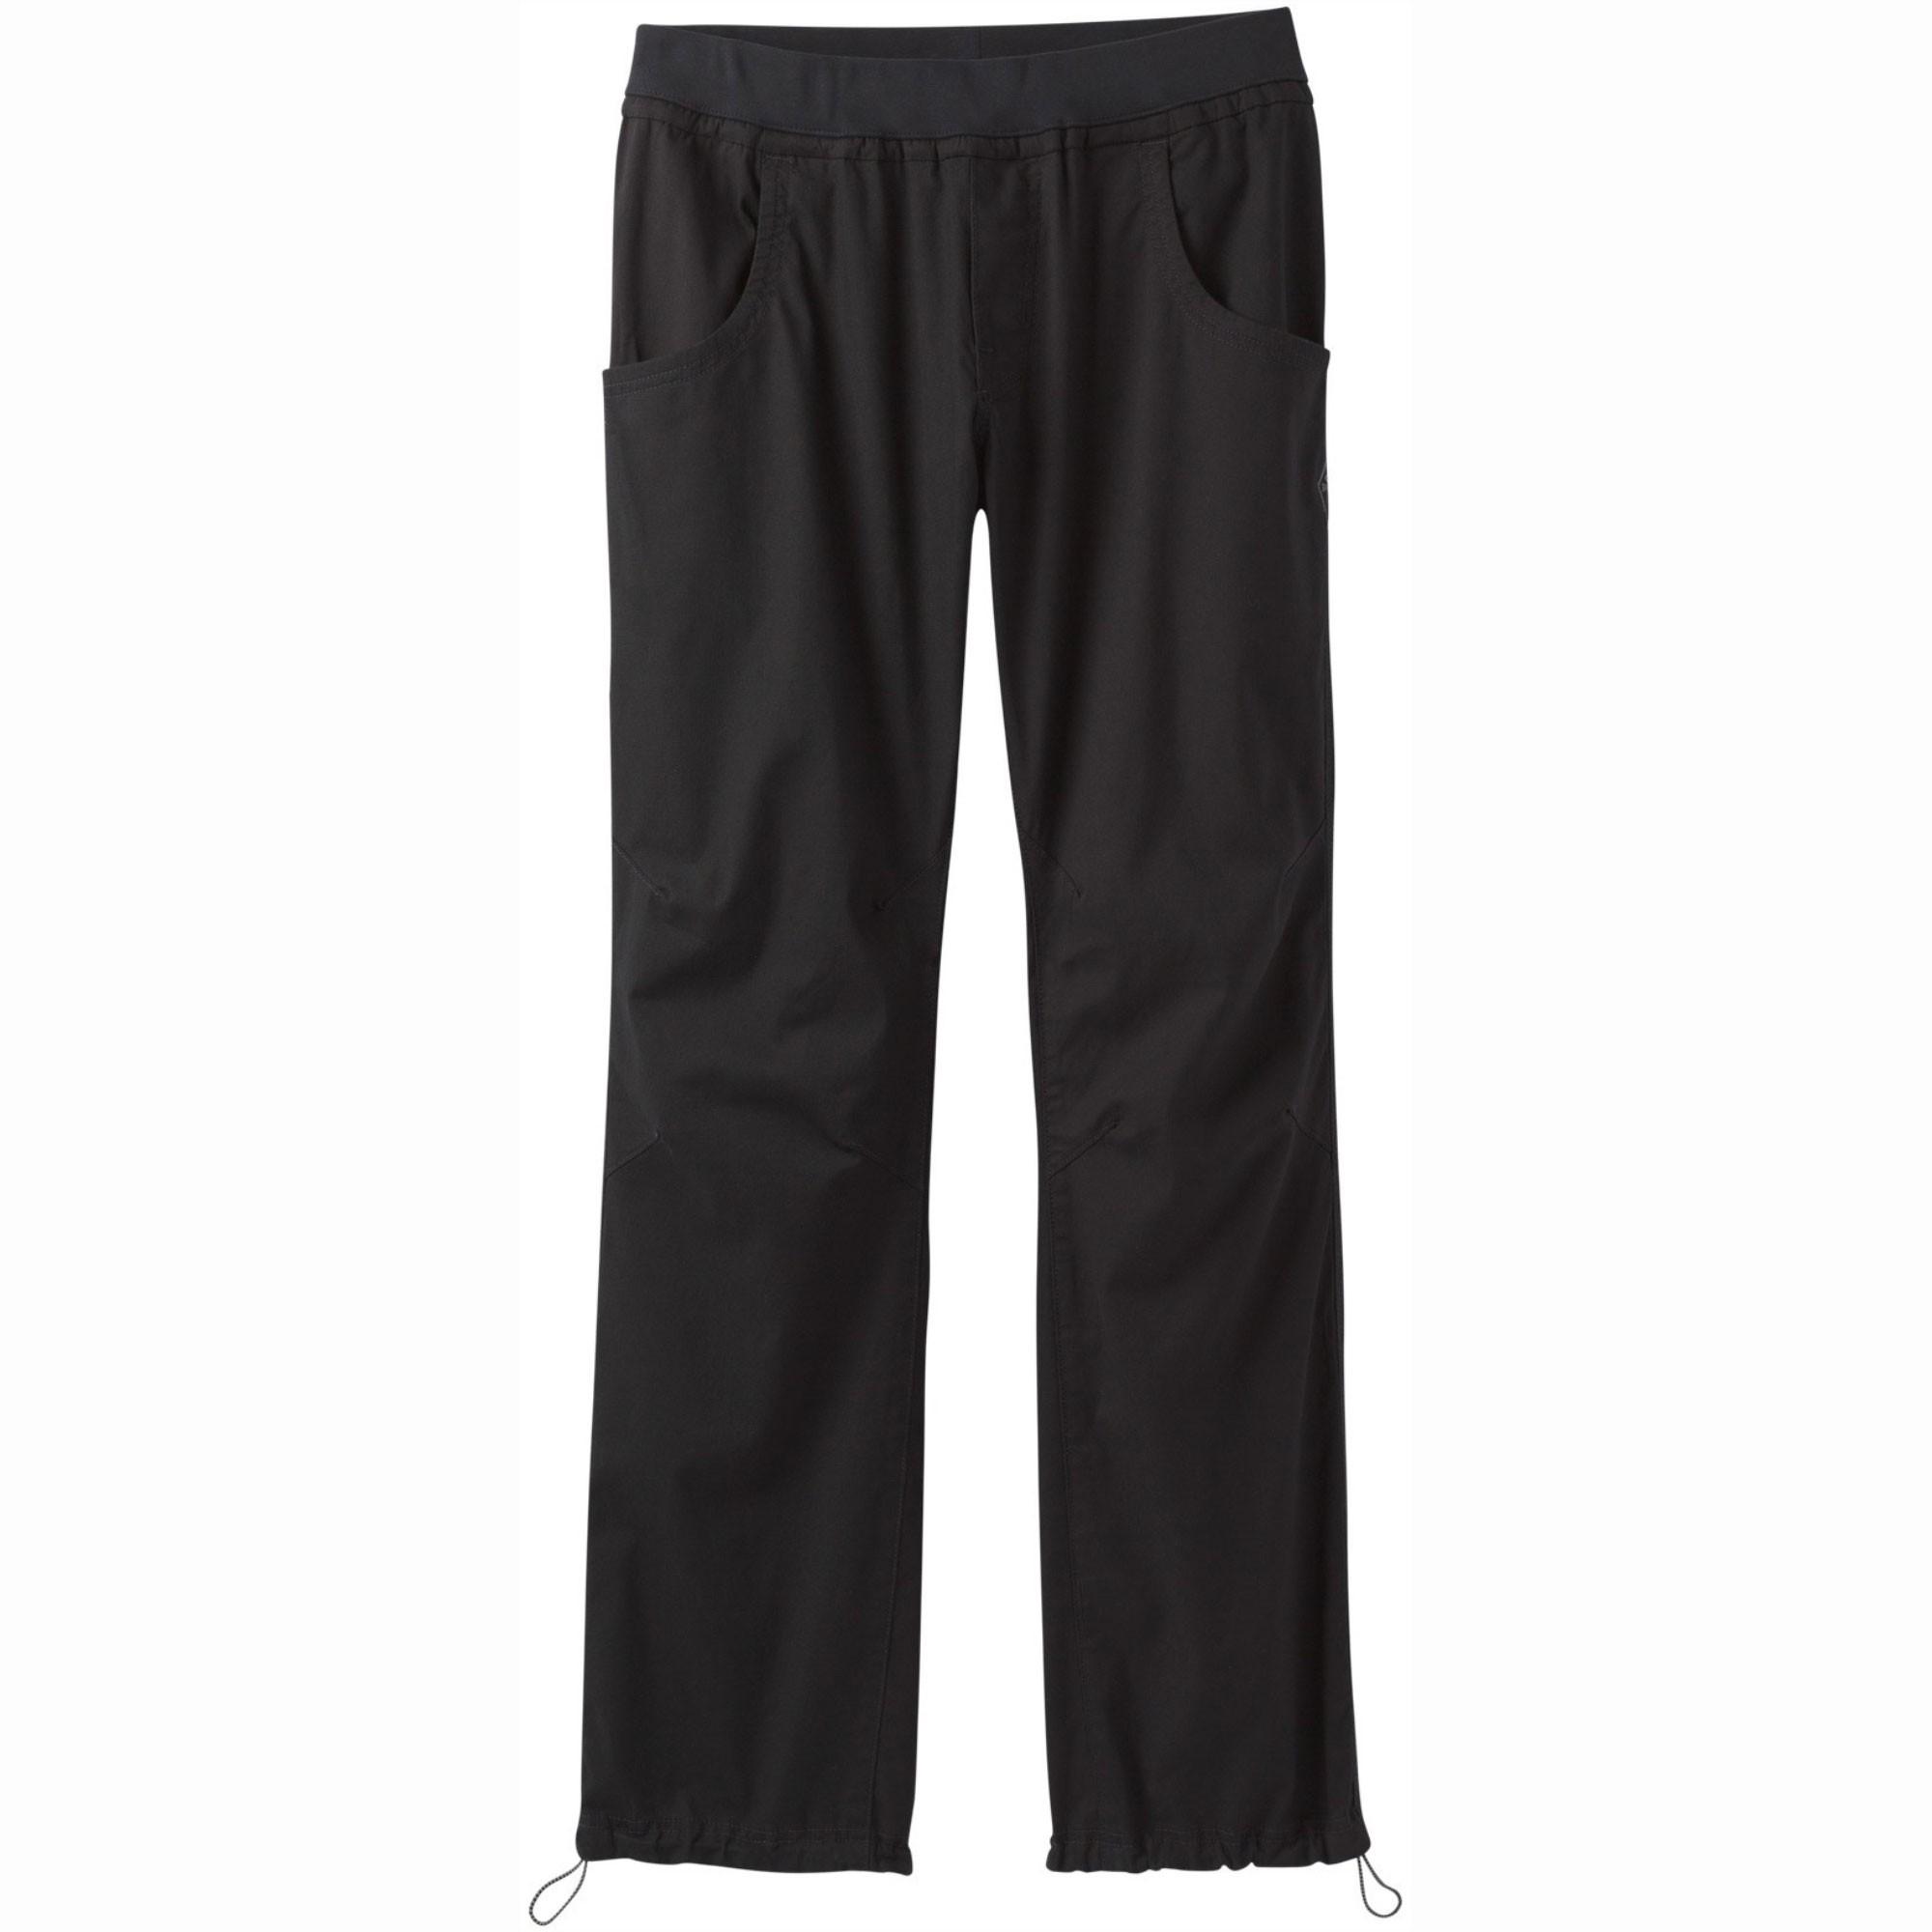 PrAna Zander Climbing Pants - Black